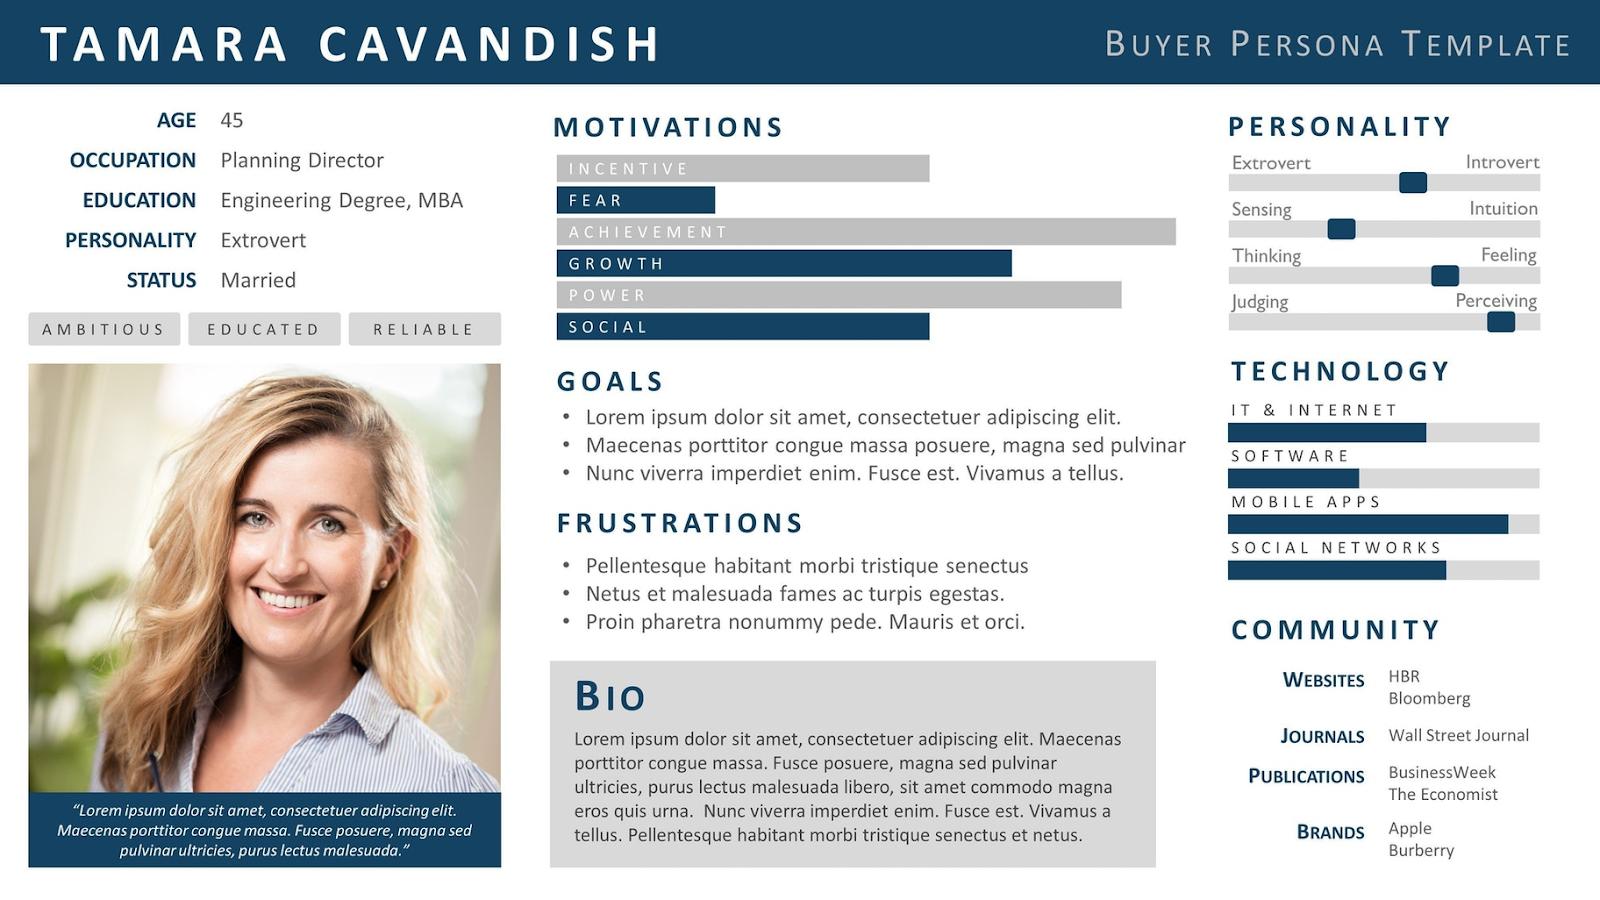 example of buyer's persona